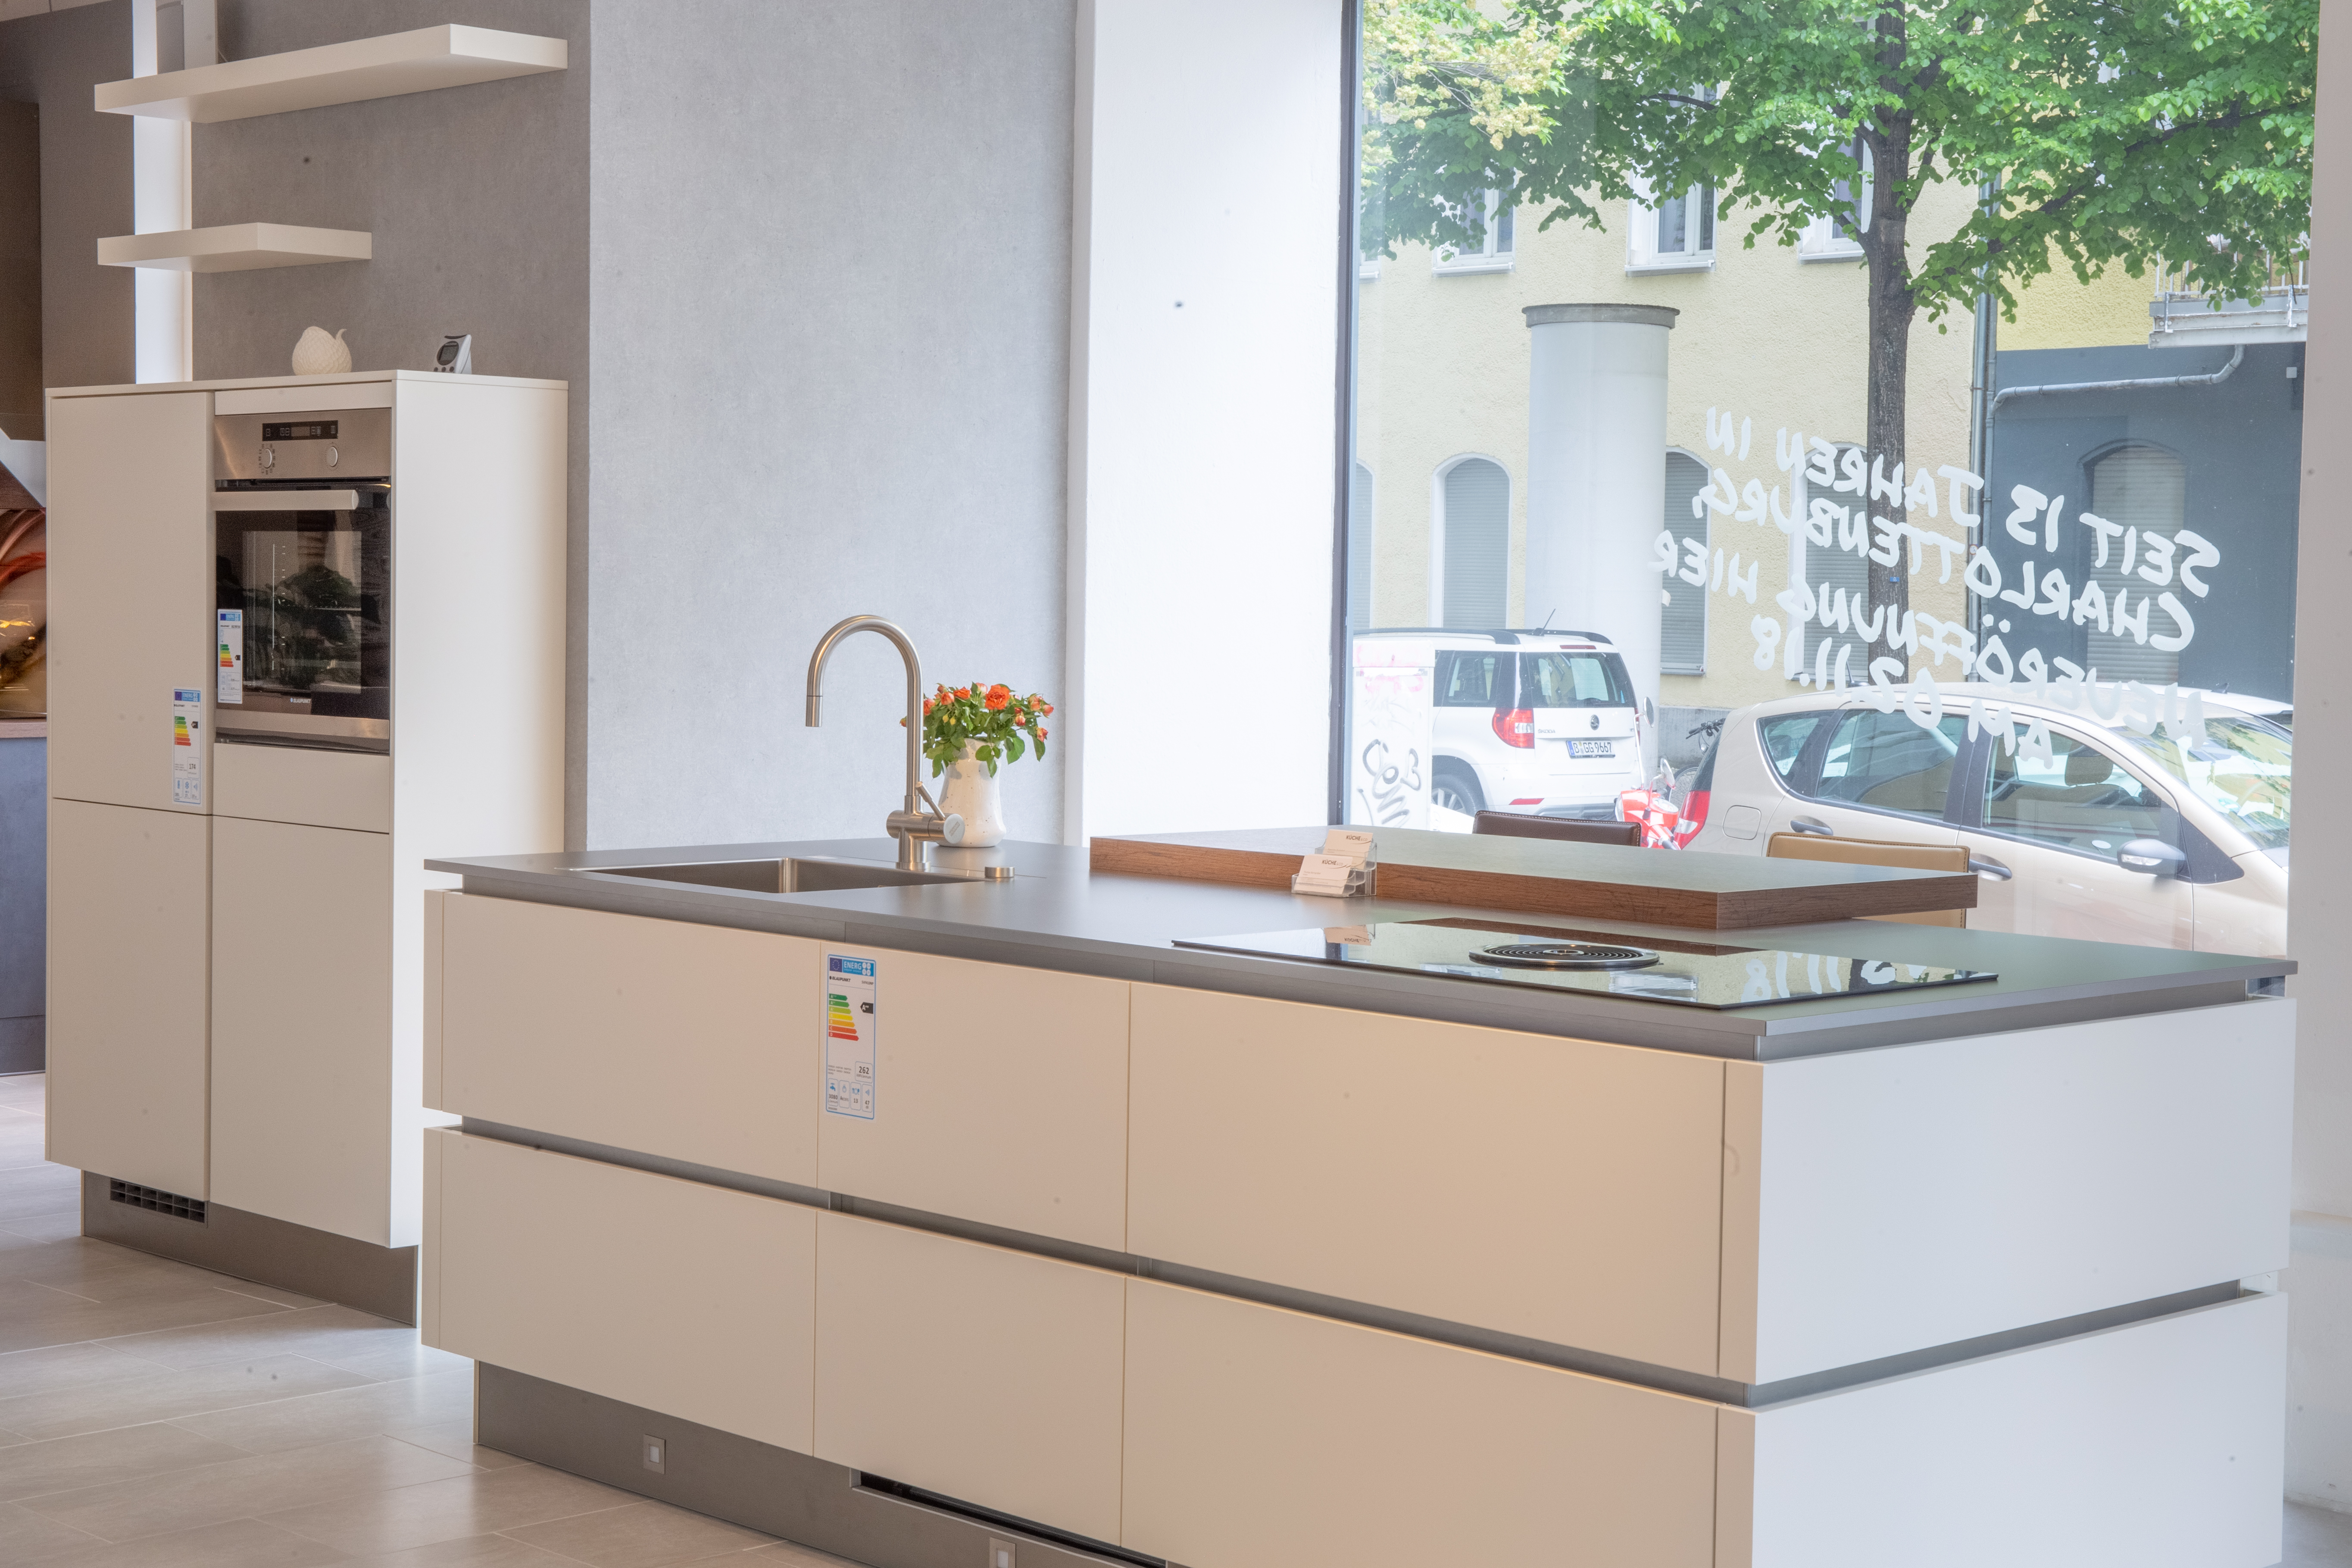 Küchenstudio Berlin-Prenzlauer Berg - Küche&Co